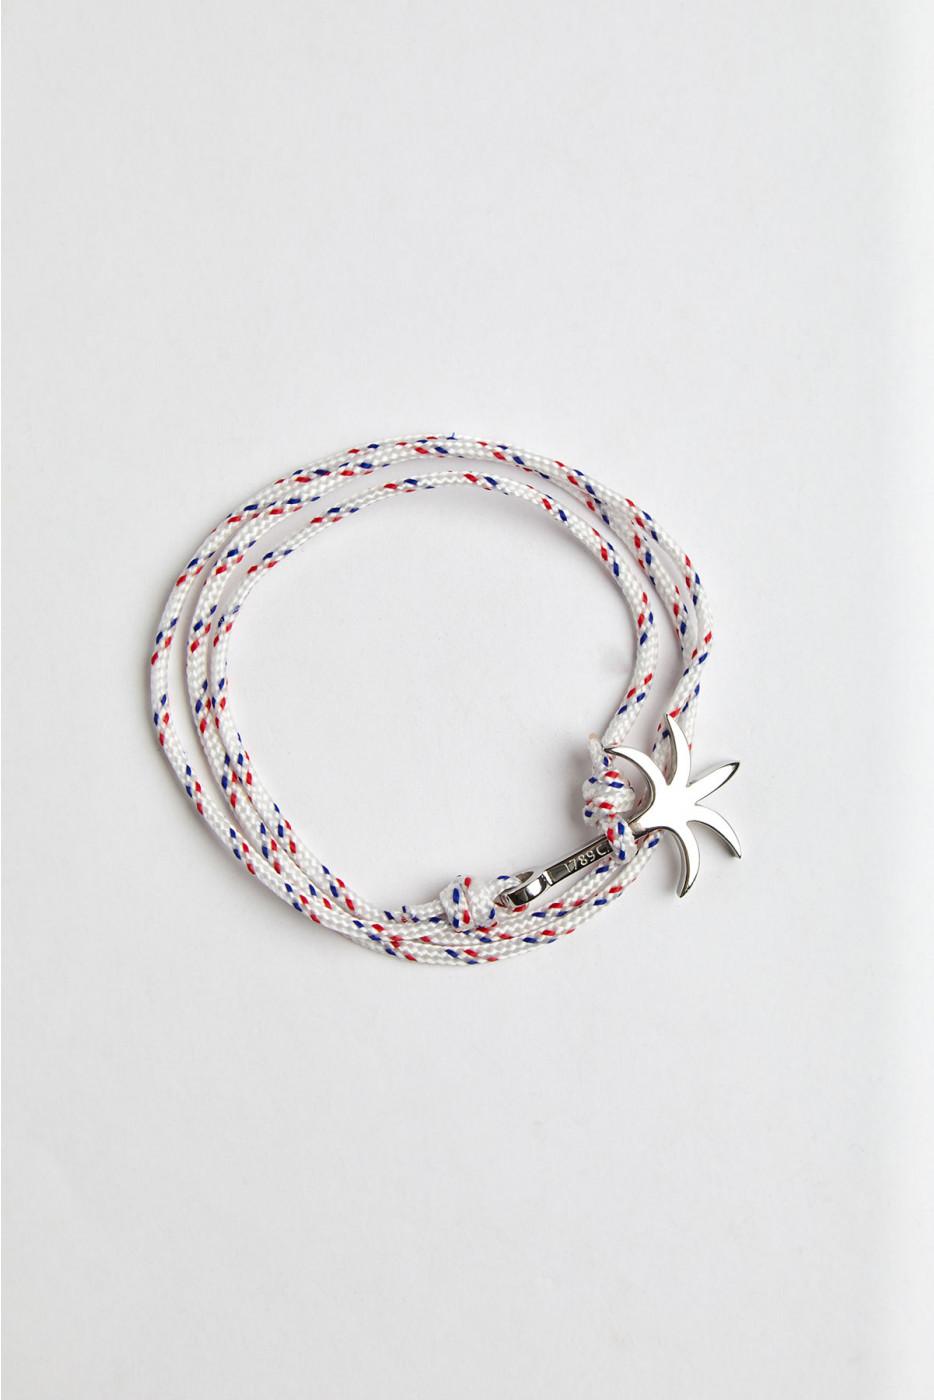 Bracelet Corde Blanc - PALMIER BRACELET